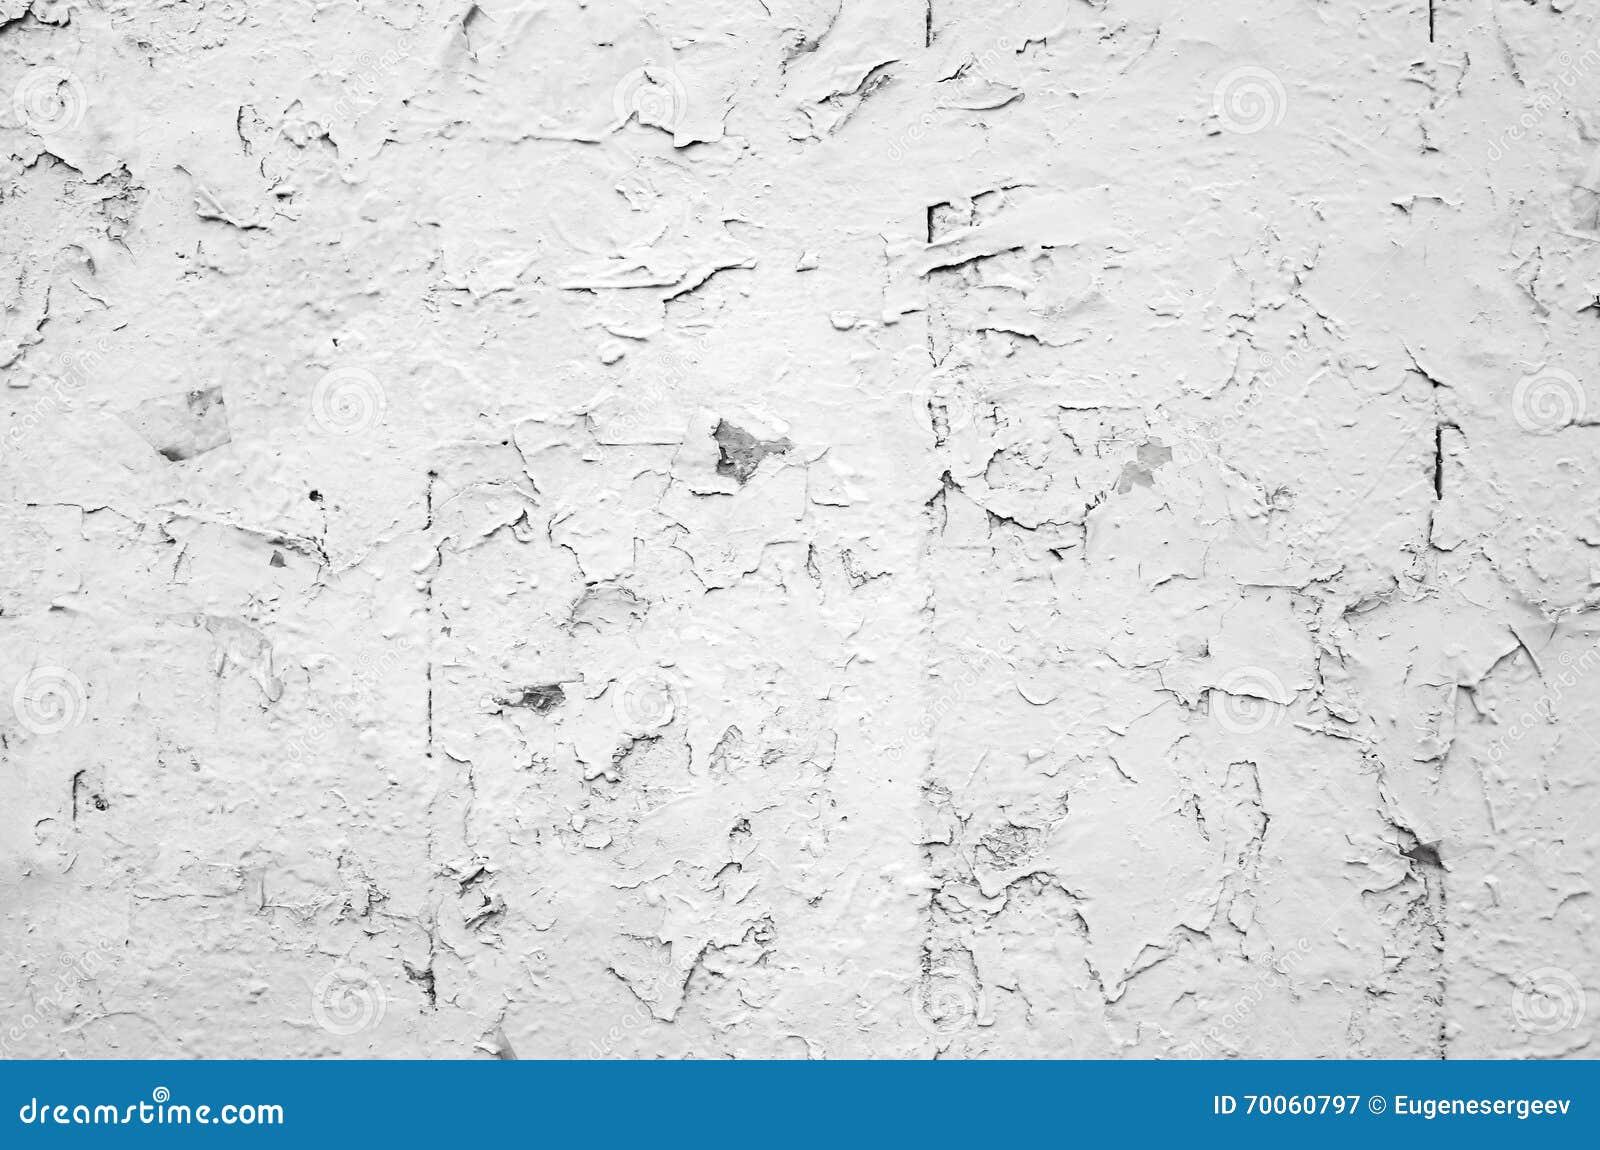 Cracked Flaking White Paint On Old Stone Wall Stock Photo Image 70060797